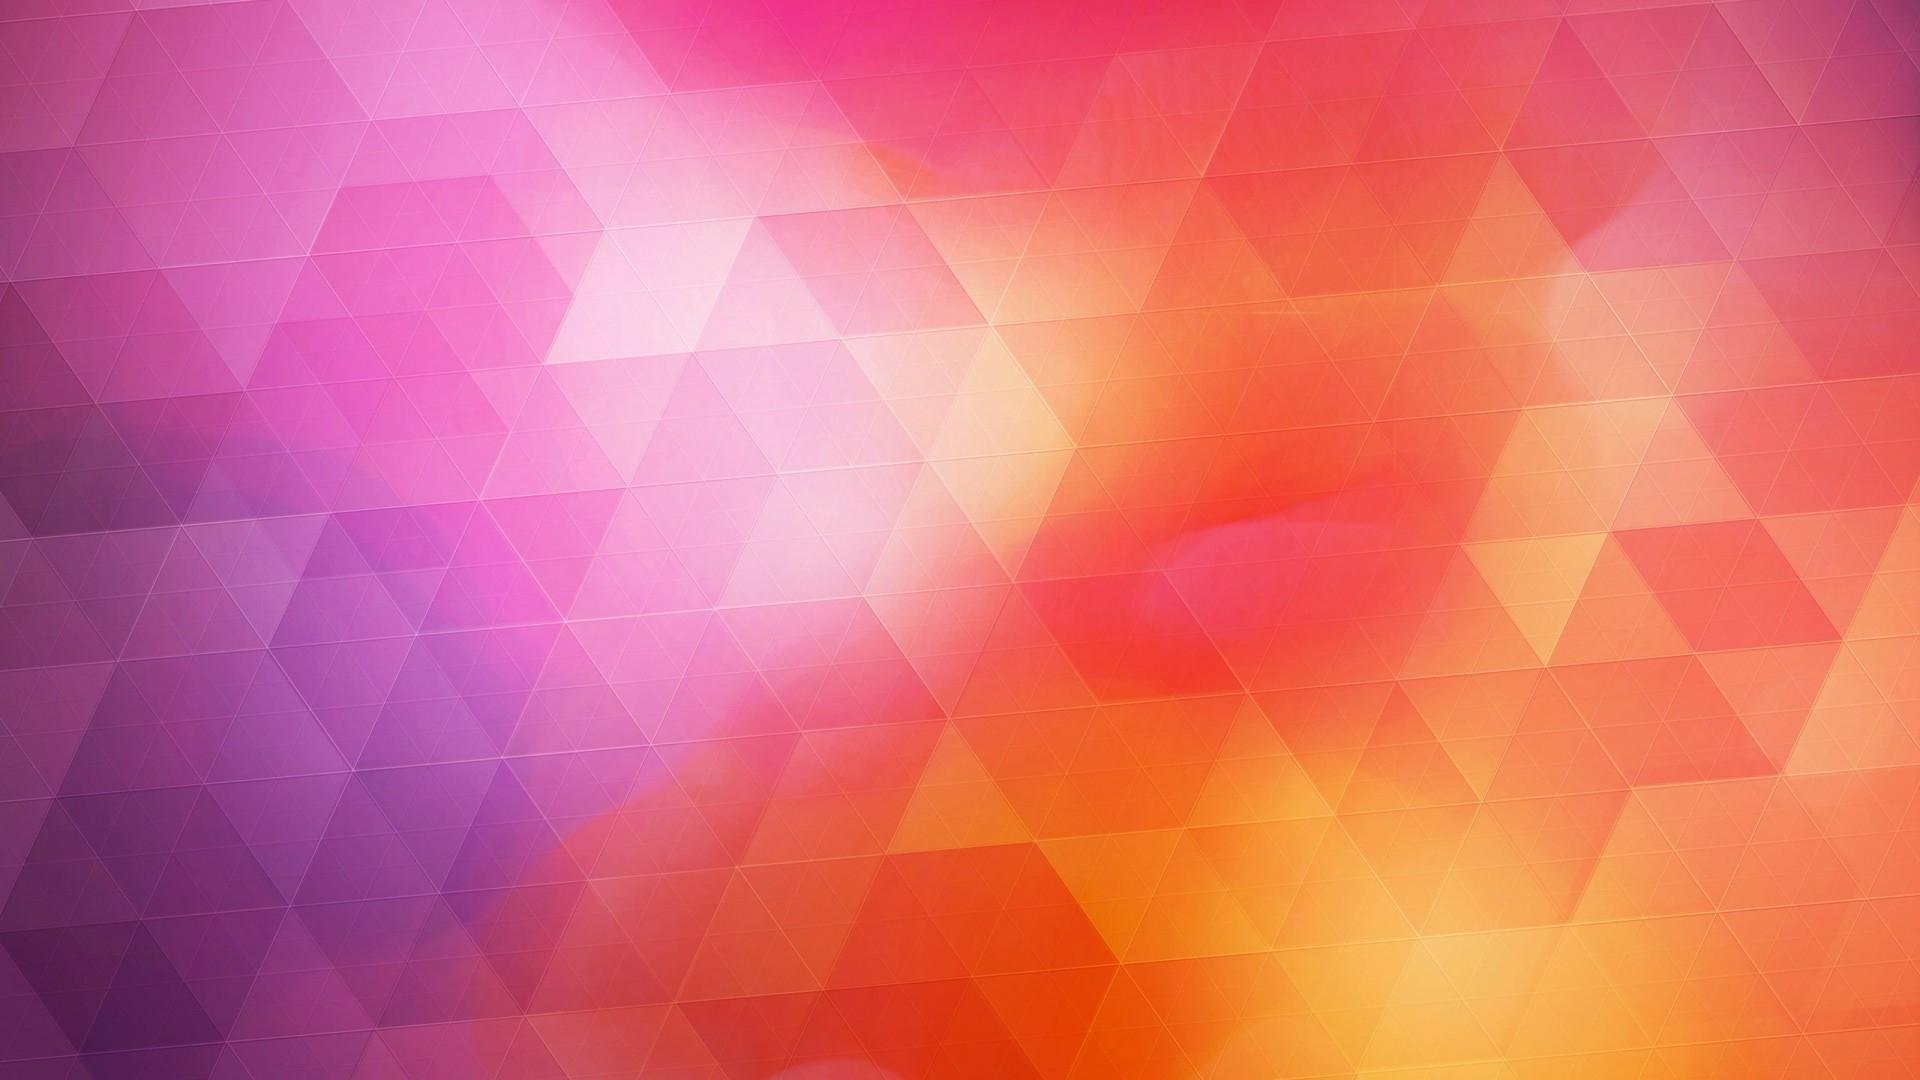 Chromebook Background Wallpaper